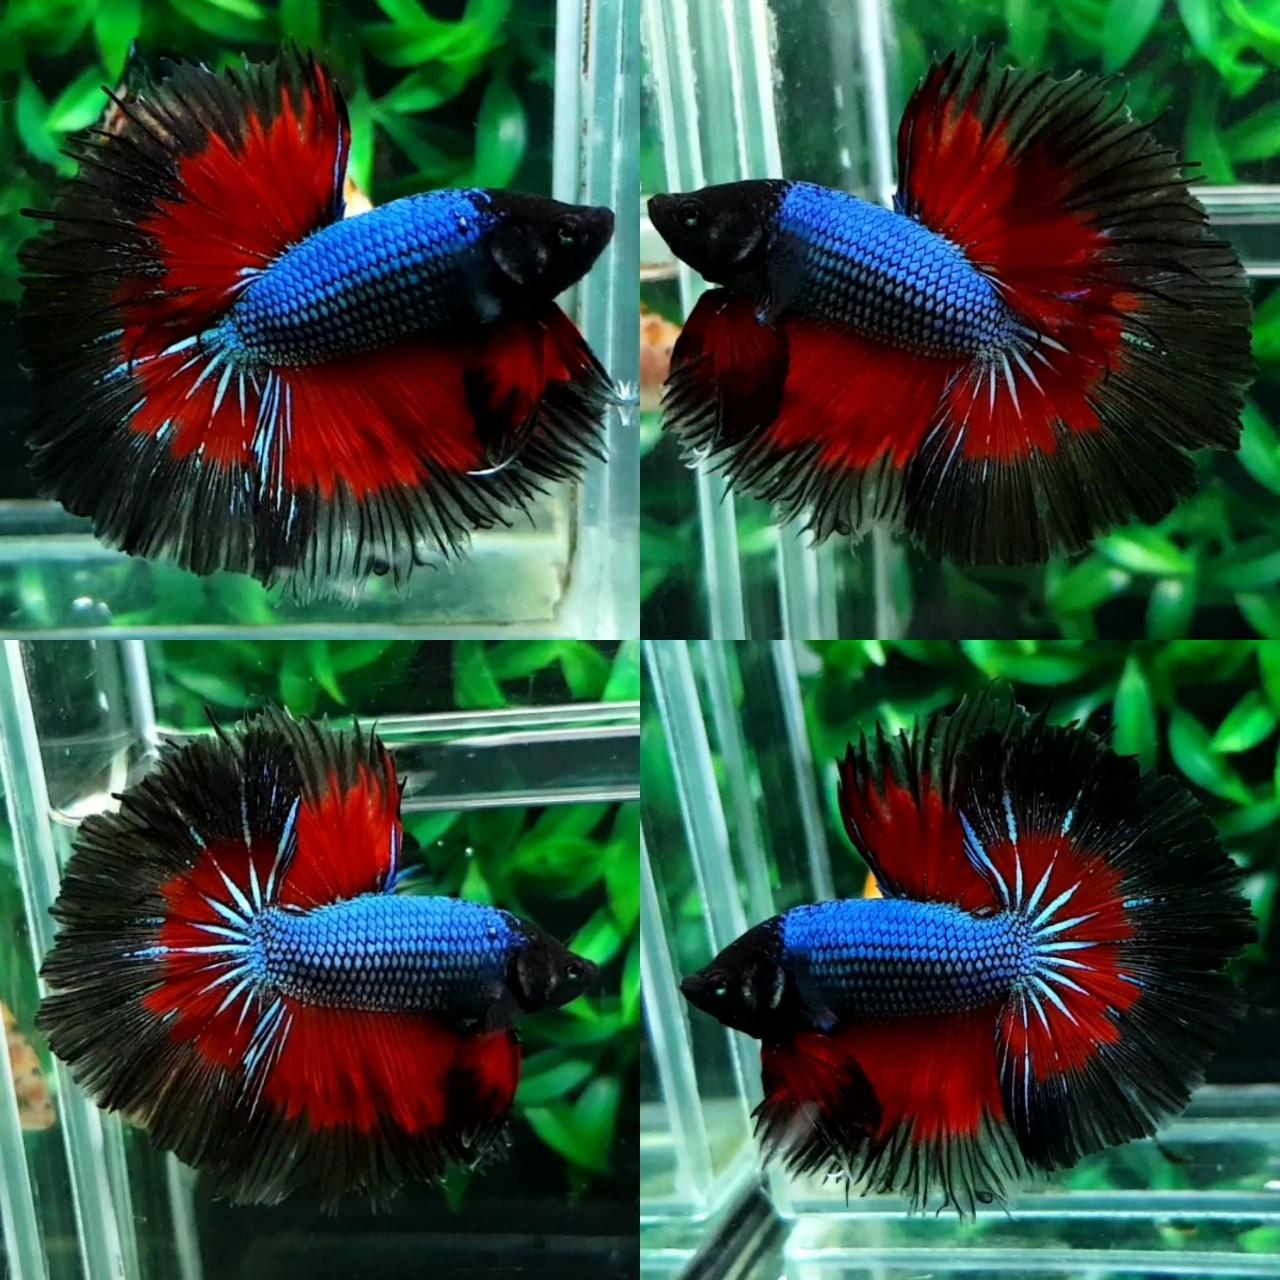 fwbettashm3102152004 - OHM male Blue Red Black Marble By Kingpetall